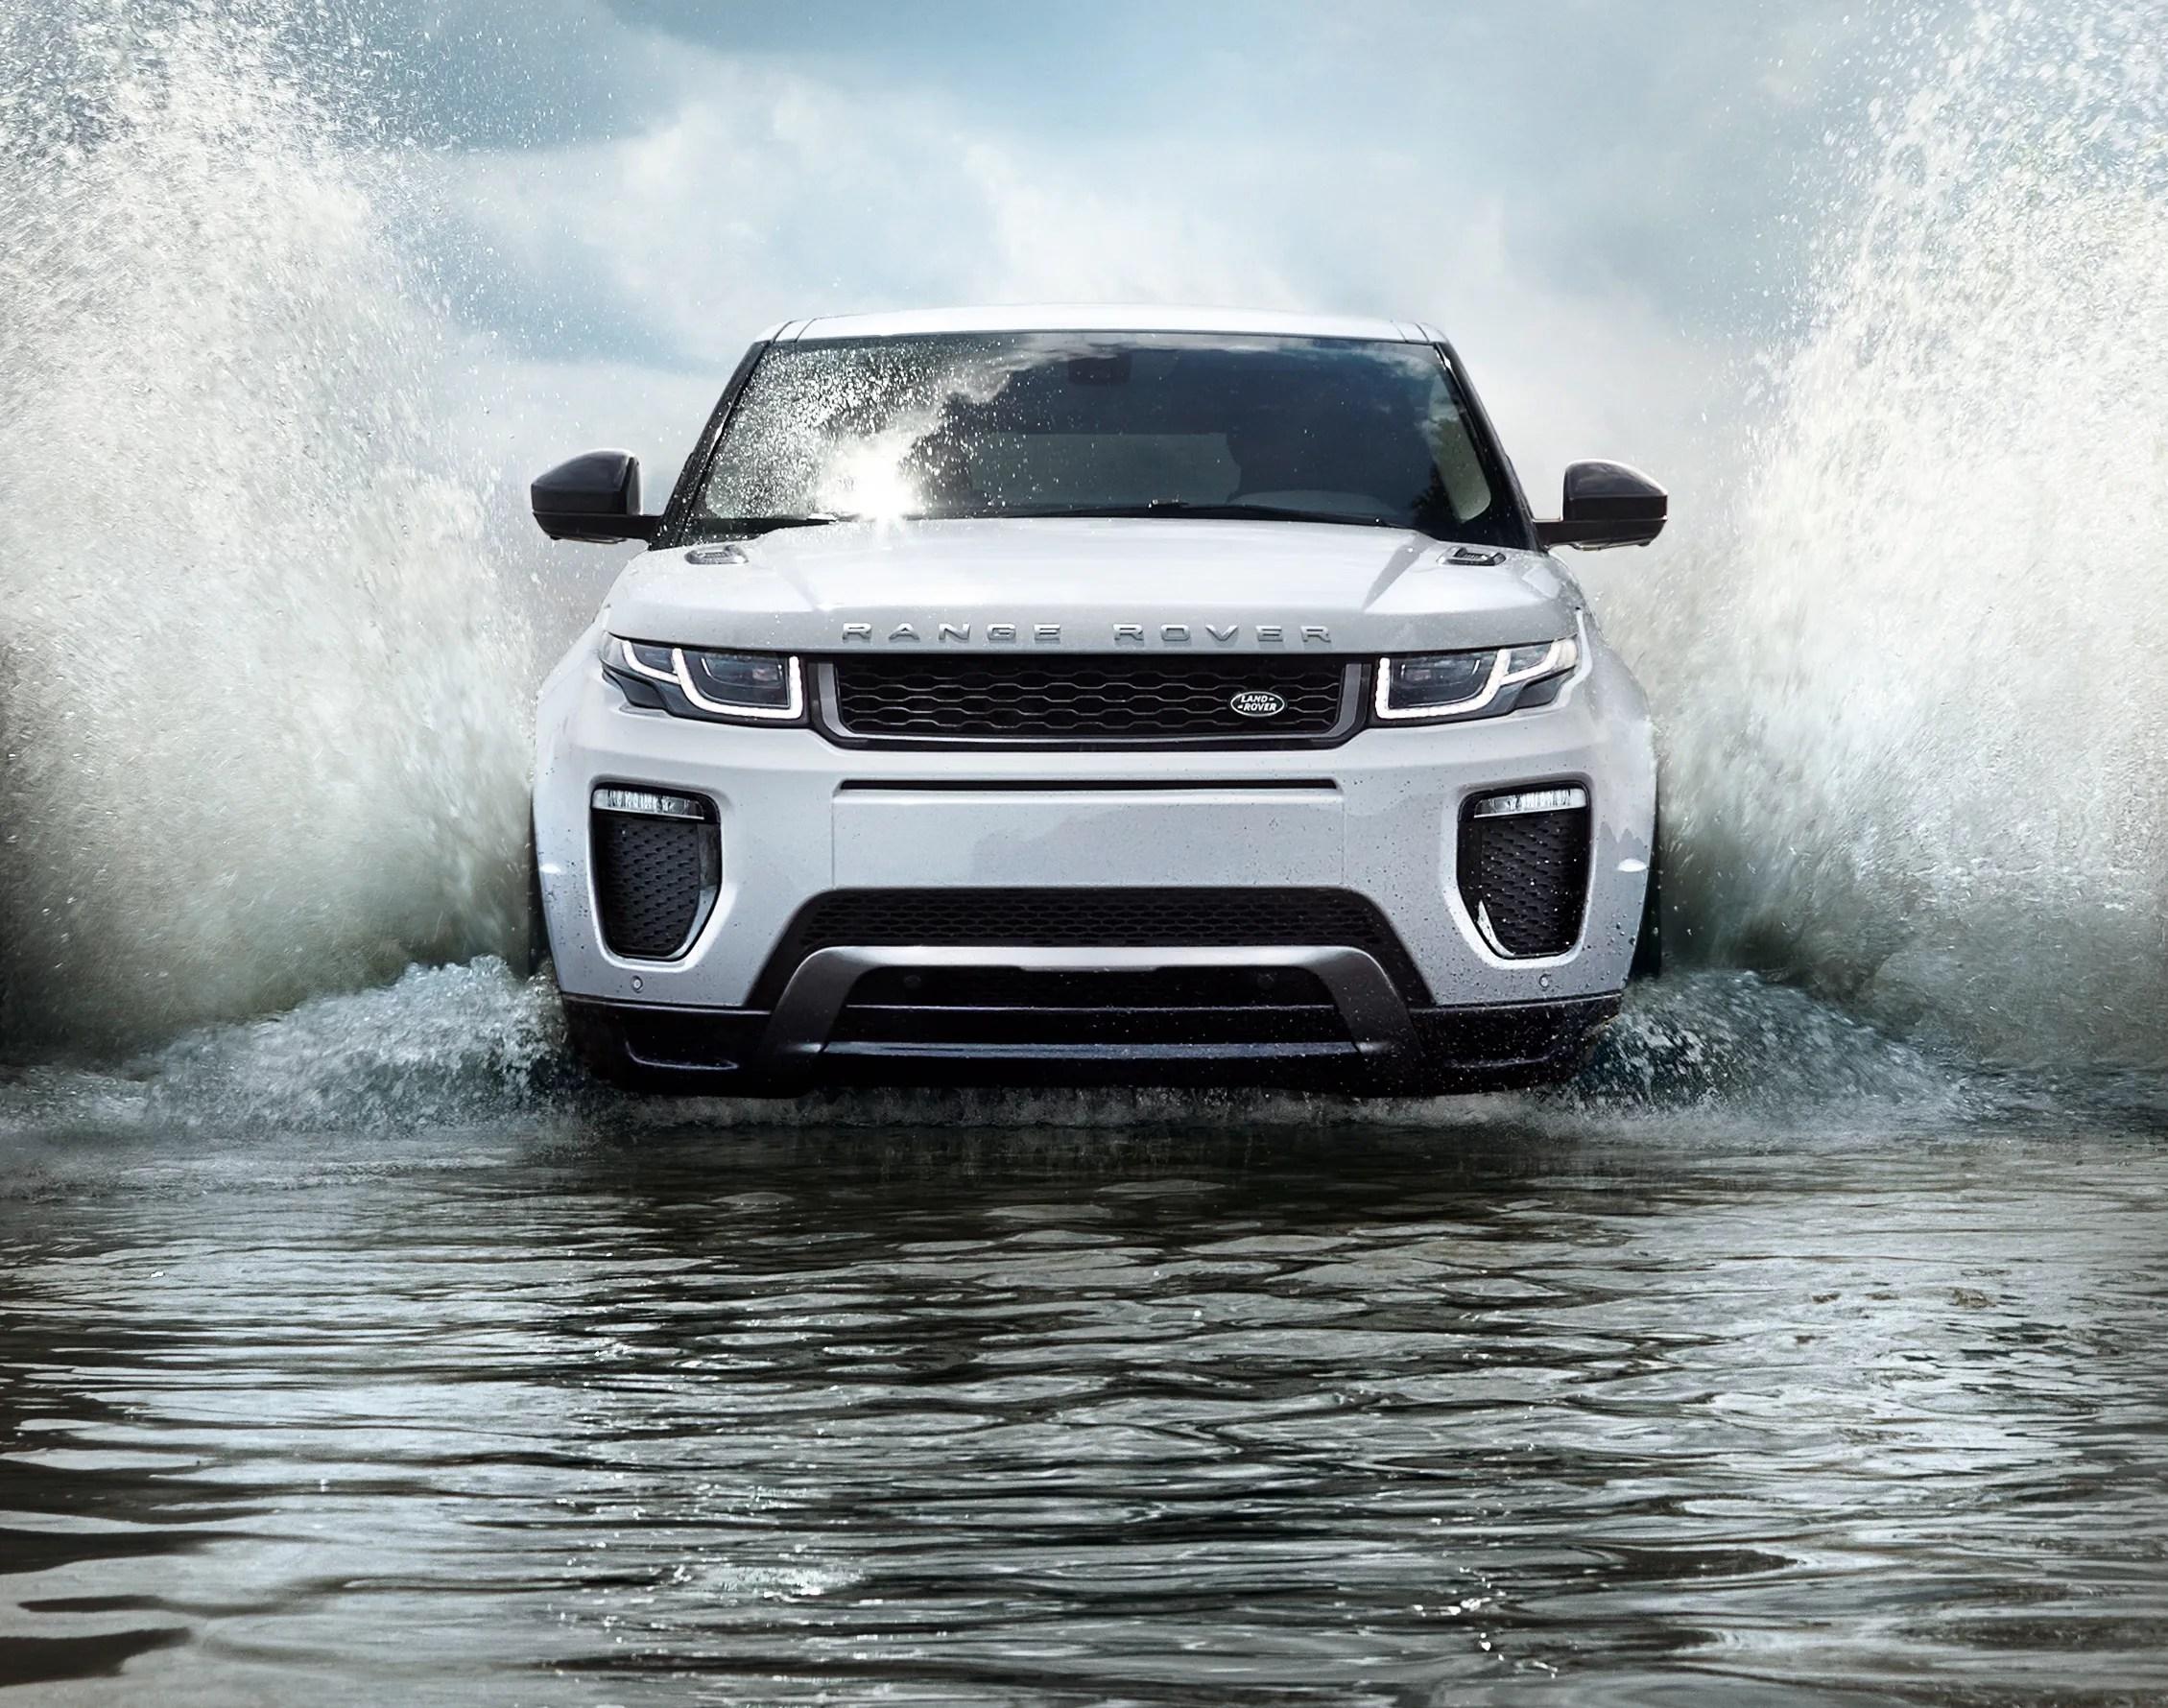 Victoria Beckham Didn t Design The Range Rover Evoque After All